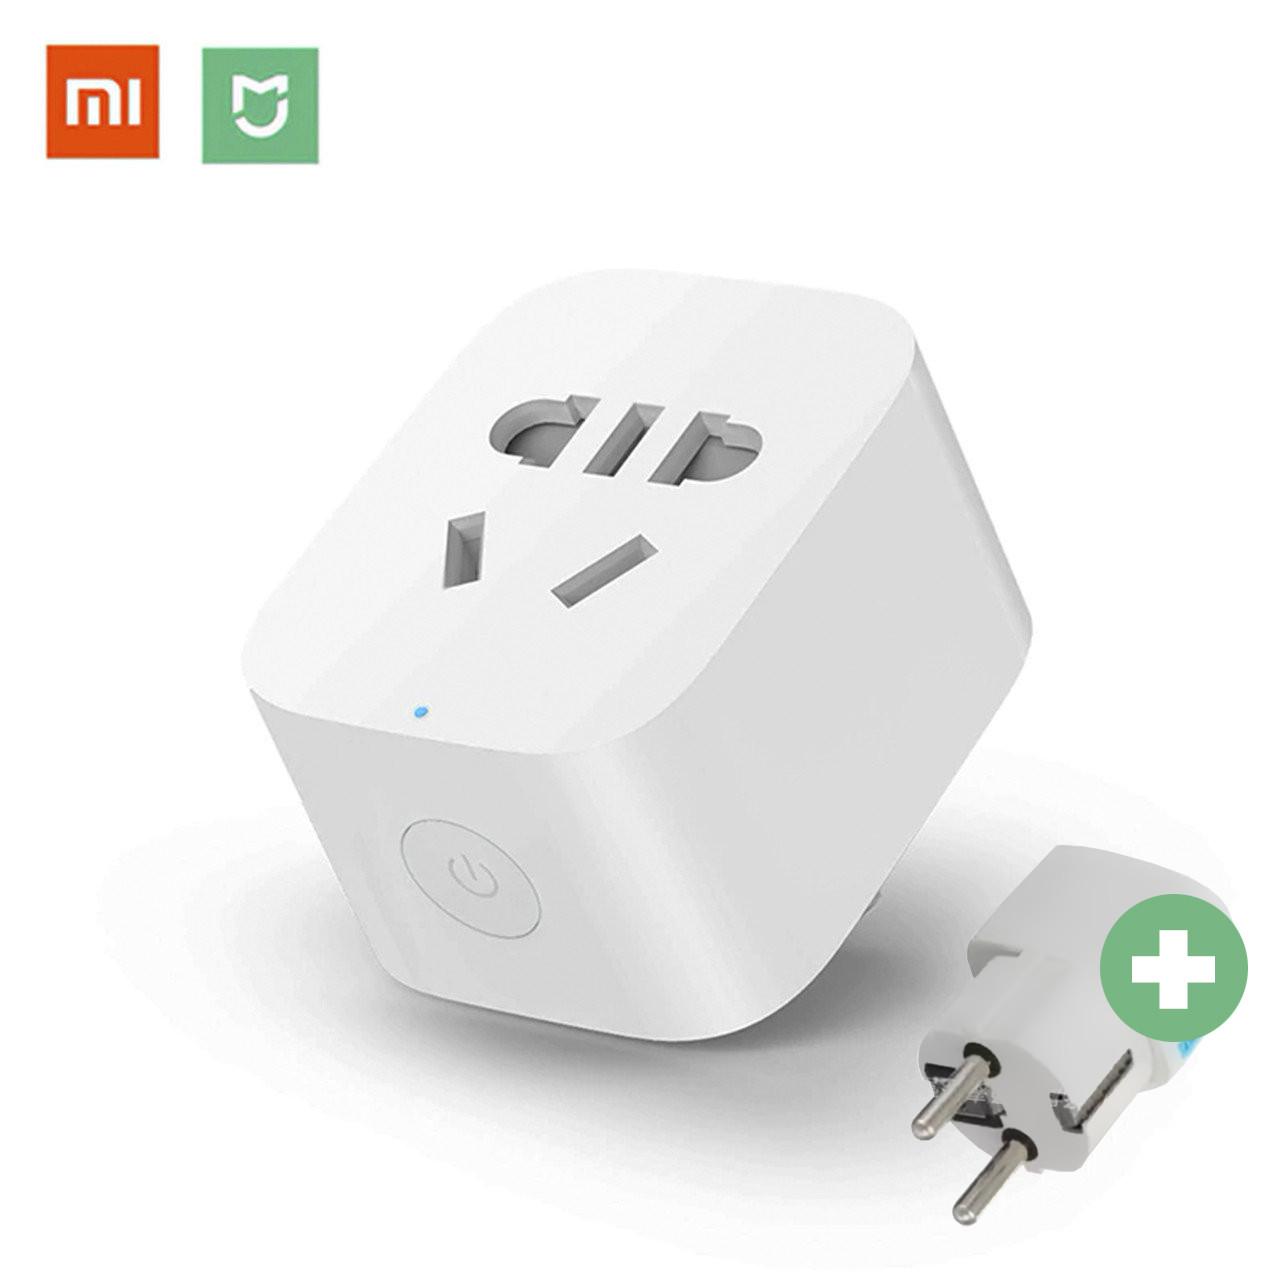 Умная розетка Xiaomi MiJia Smart Socket 2 Wi-Fi (ZNCZ04CM) умный смарт дом smart house